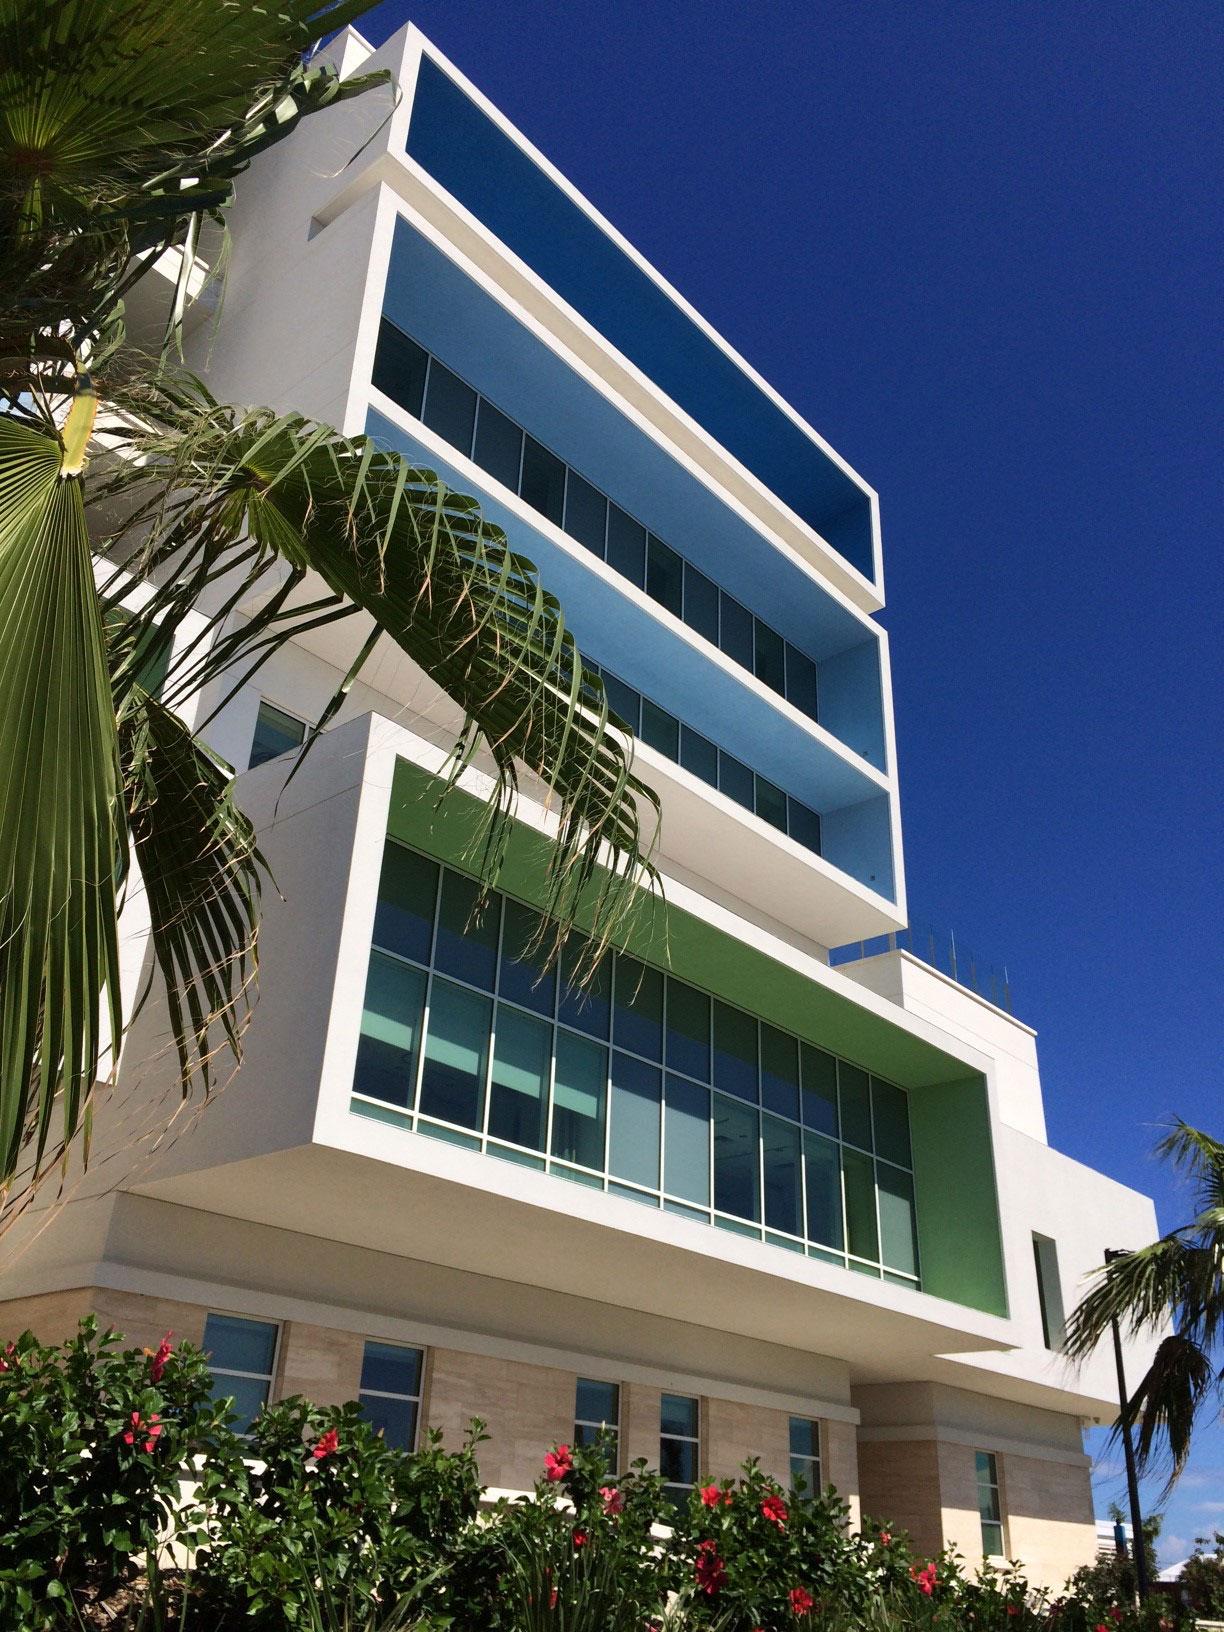 King Edward Memorial Hospital - Completed Facade